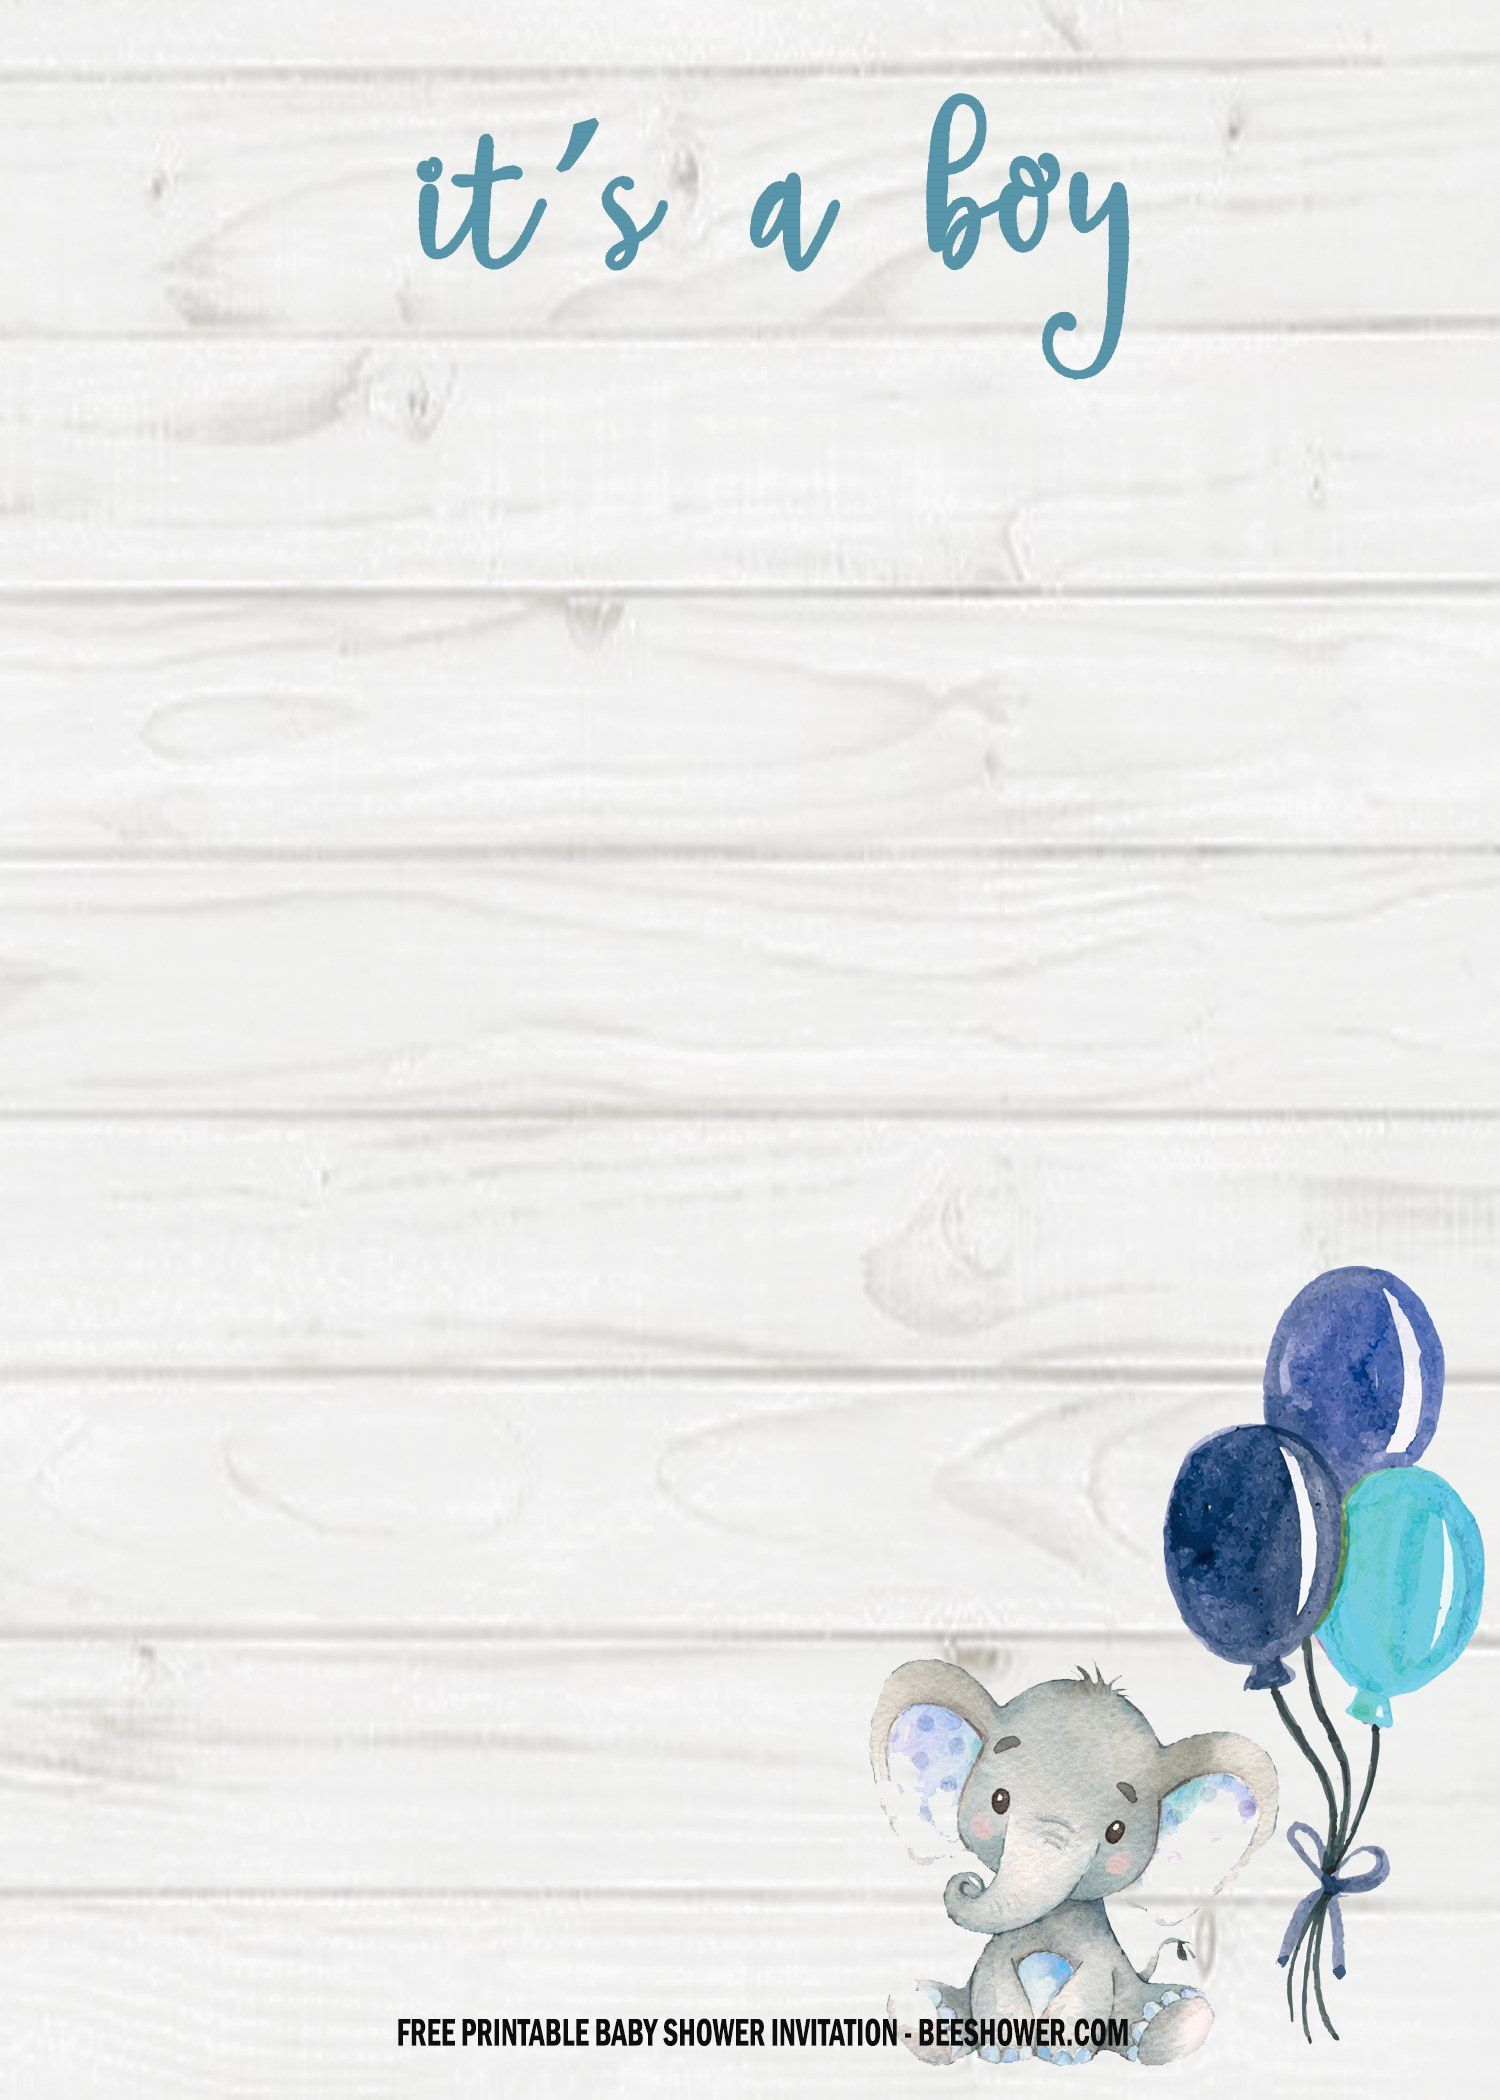 006 Marvelou Elephant Baby Shower Invitation Template Example  Templates Free Pdf BoyFull